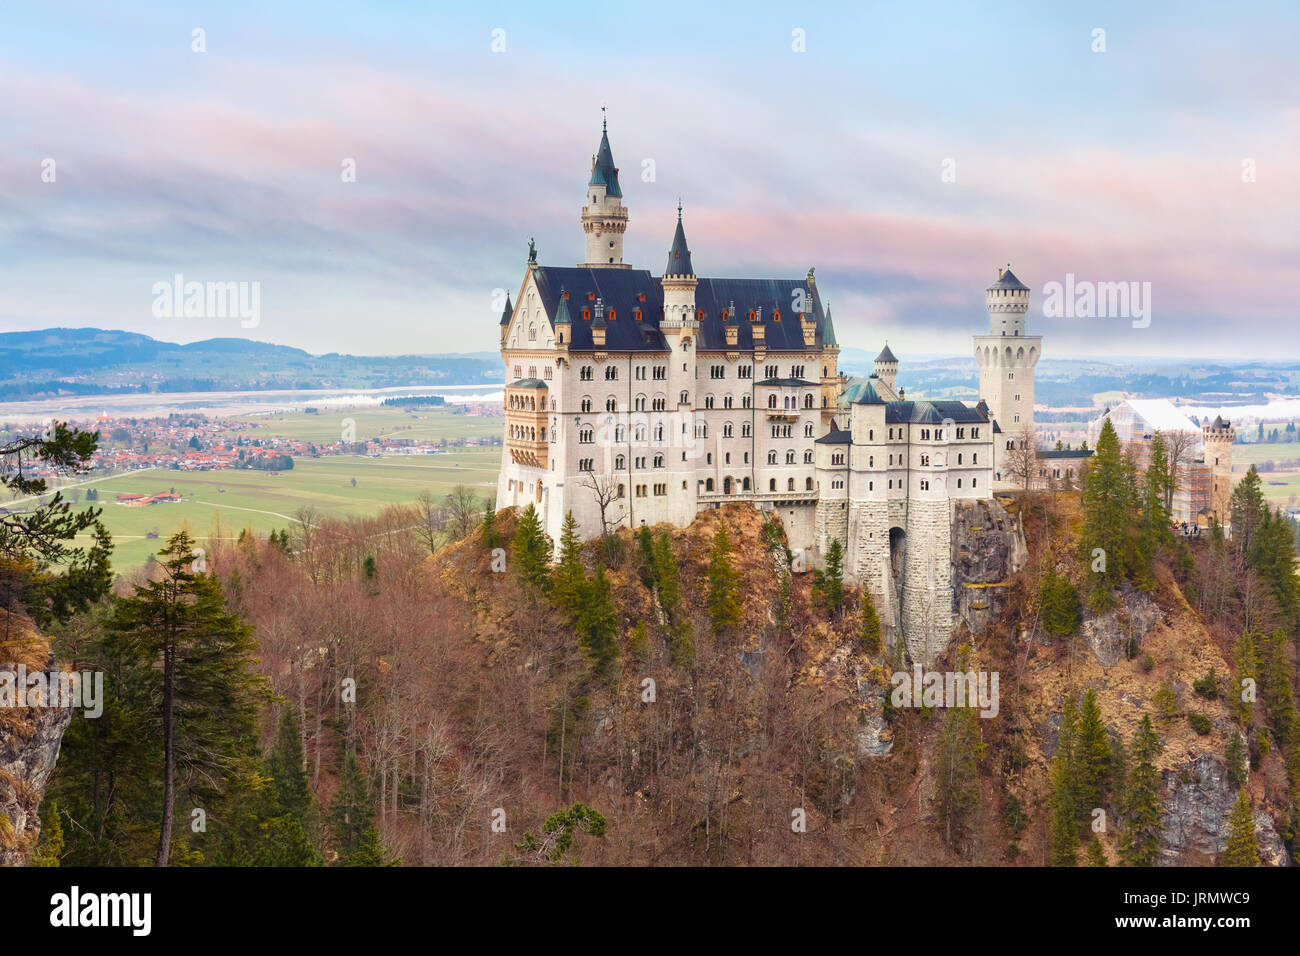 Fairytale Château de Neuschwanstein, Bavière, Allemagne Photo Stock